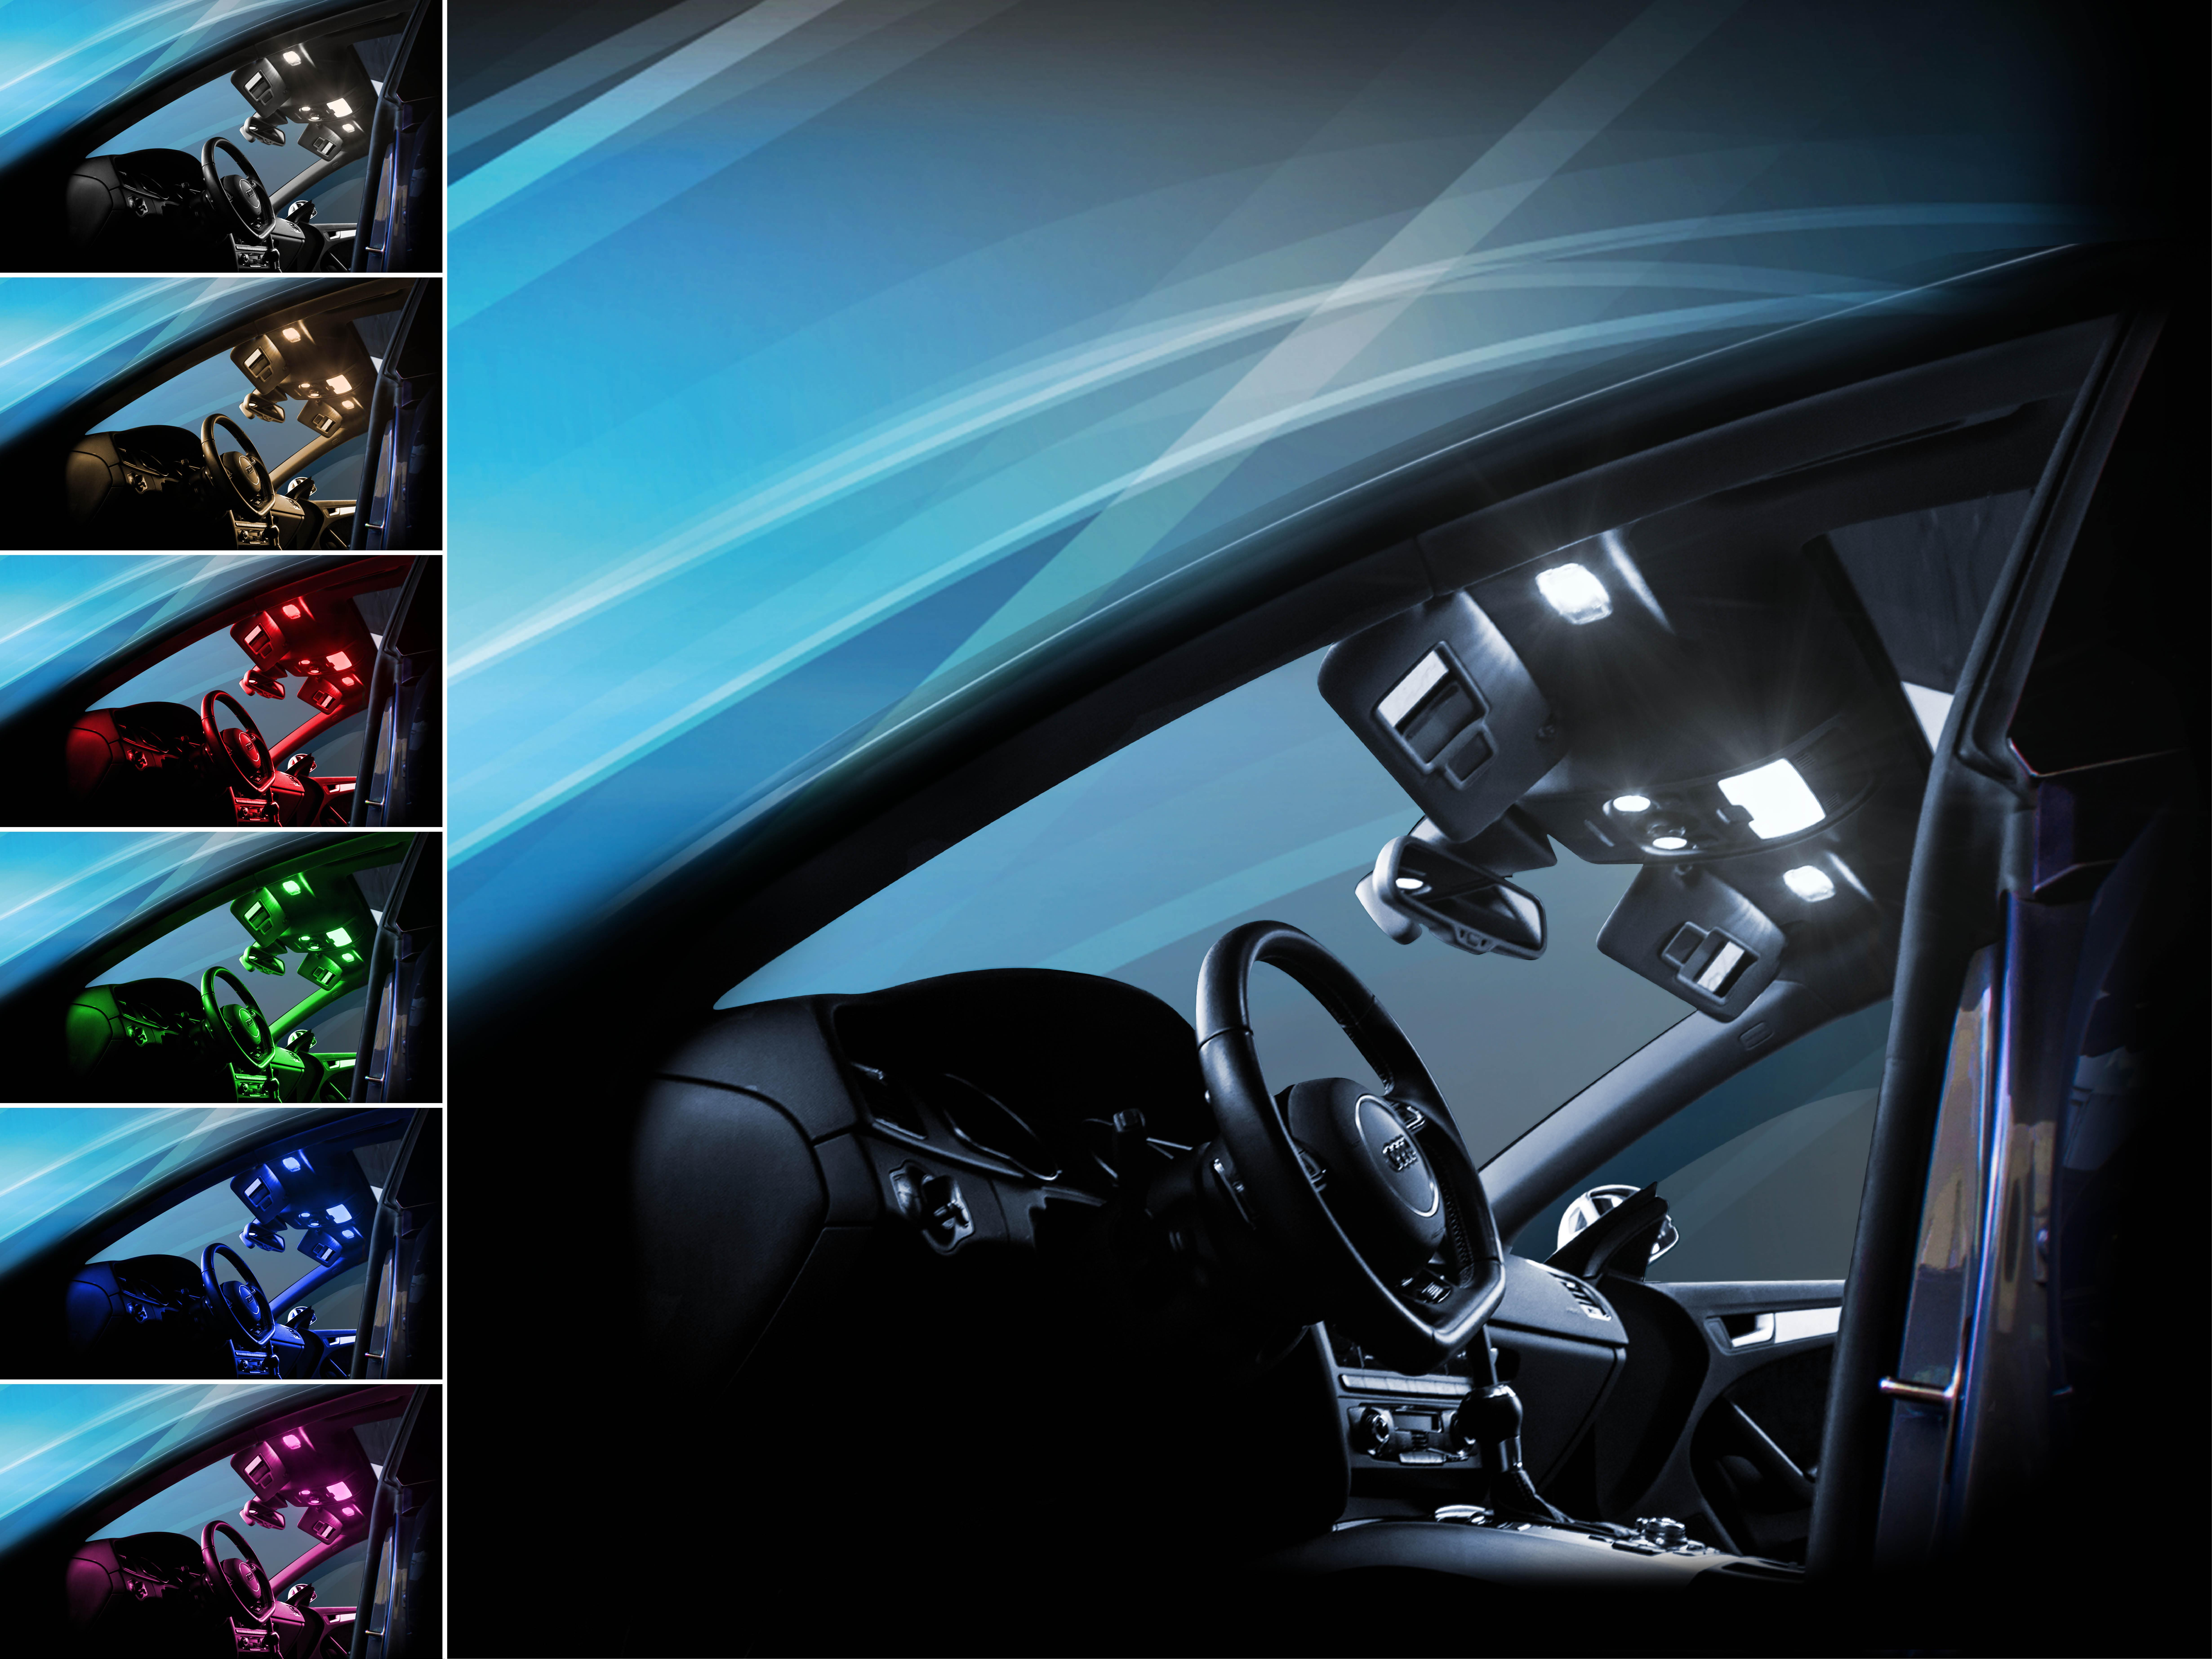 ml_innenraum_2_g Wunderbar Led Lampen Auto Innenraum Dekorationen